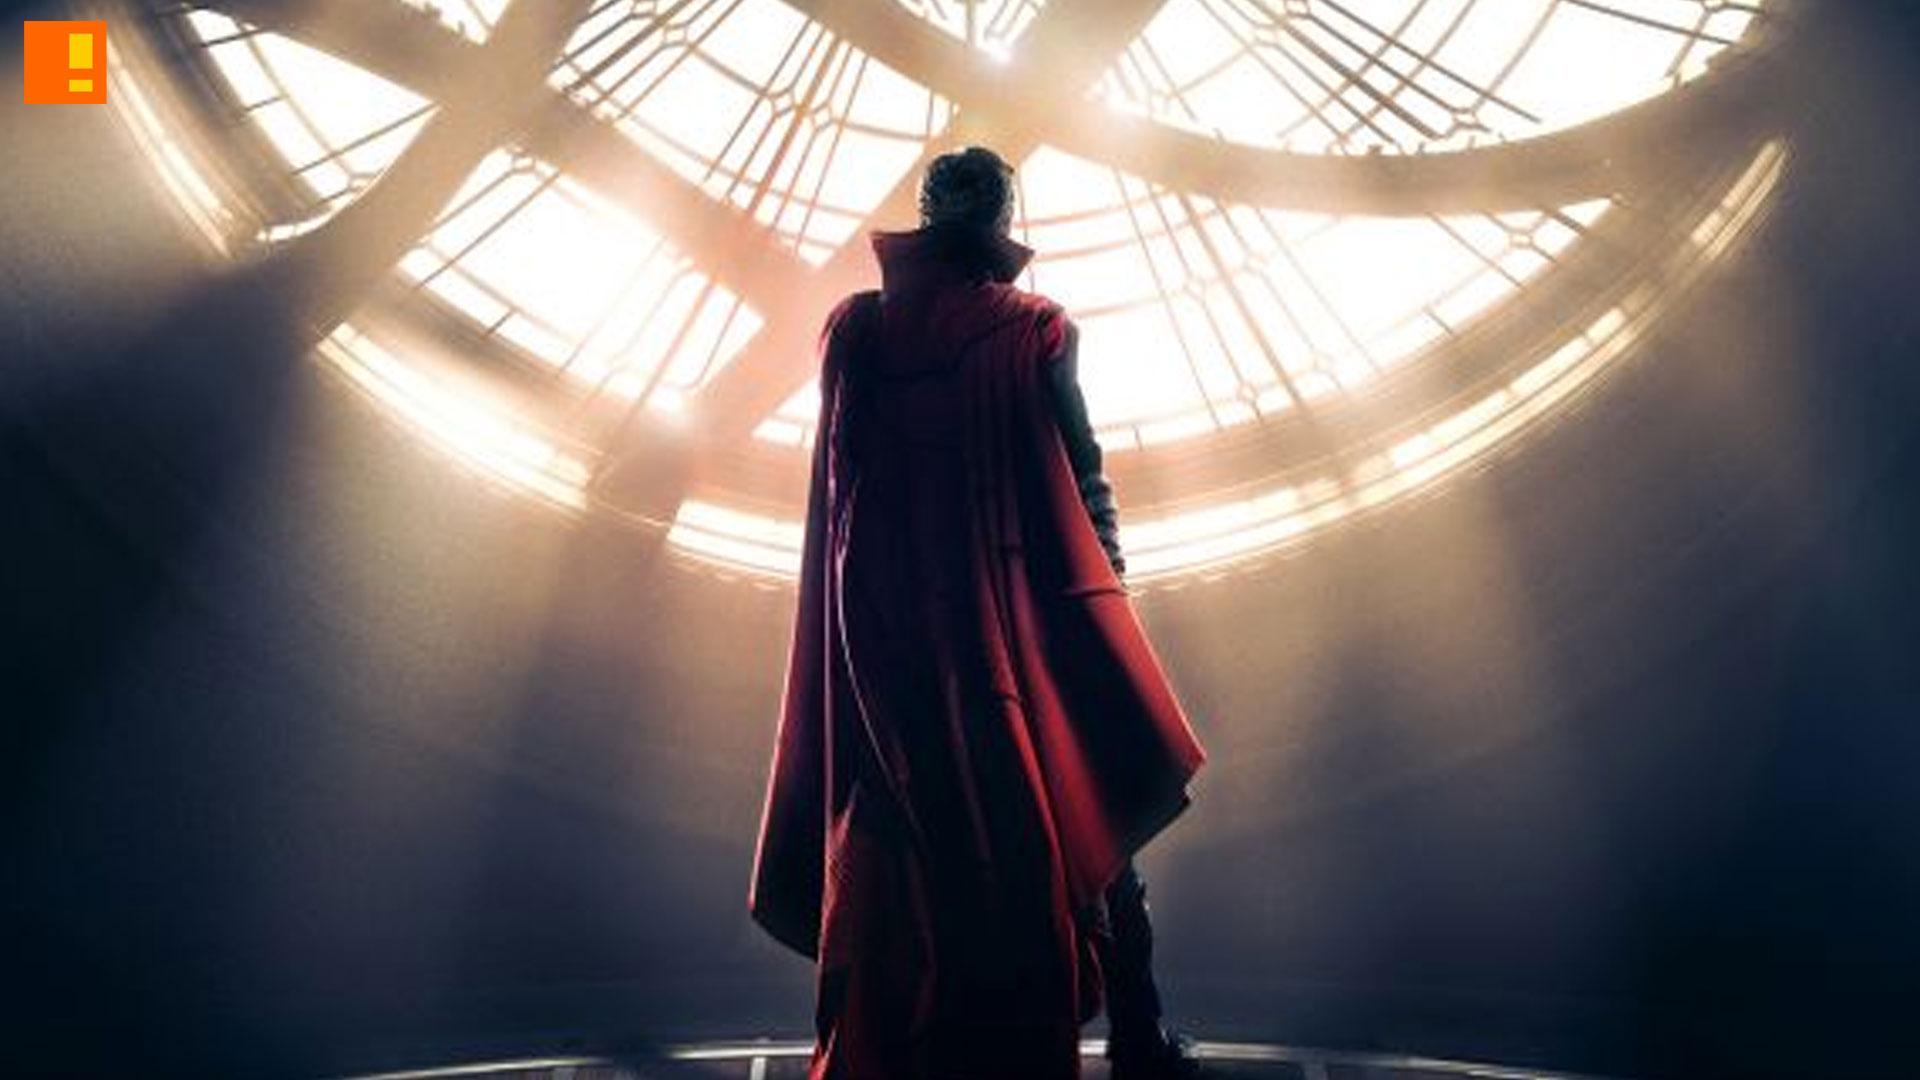 doctor strange, poster,the action pixel, @theactionpixel, benedict cumberbatch, doctor strange, poster, art, design, marvel